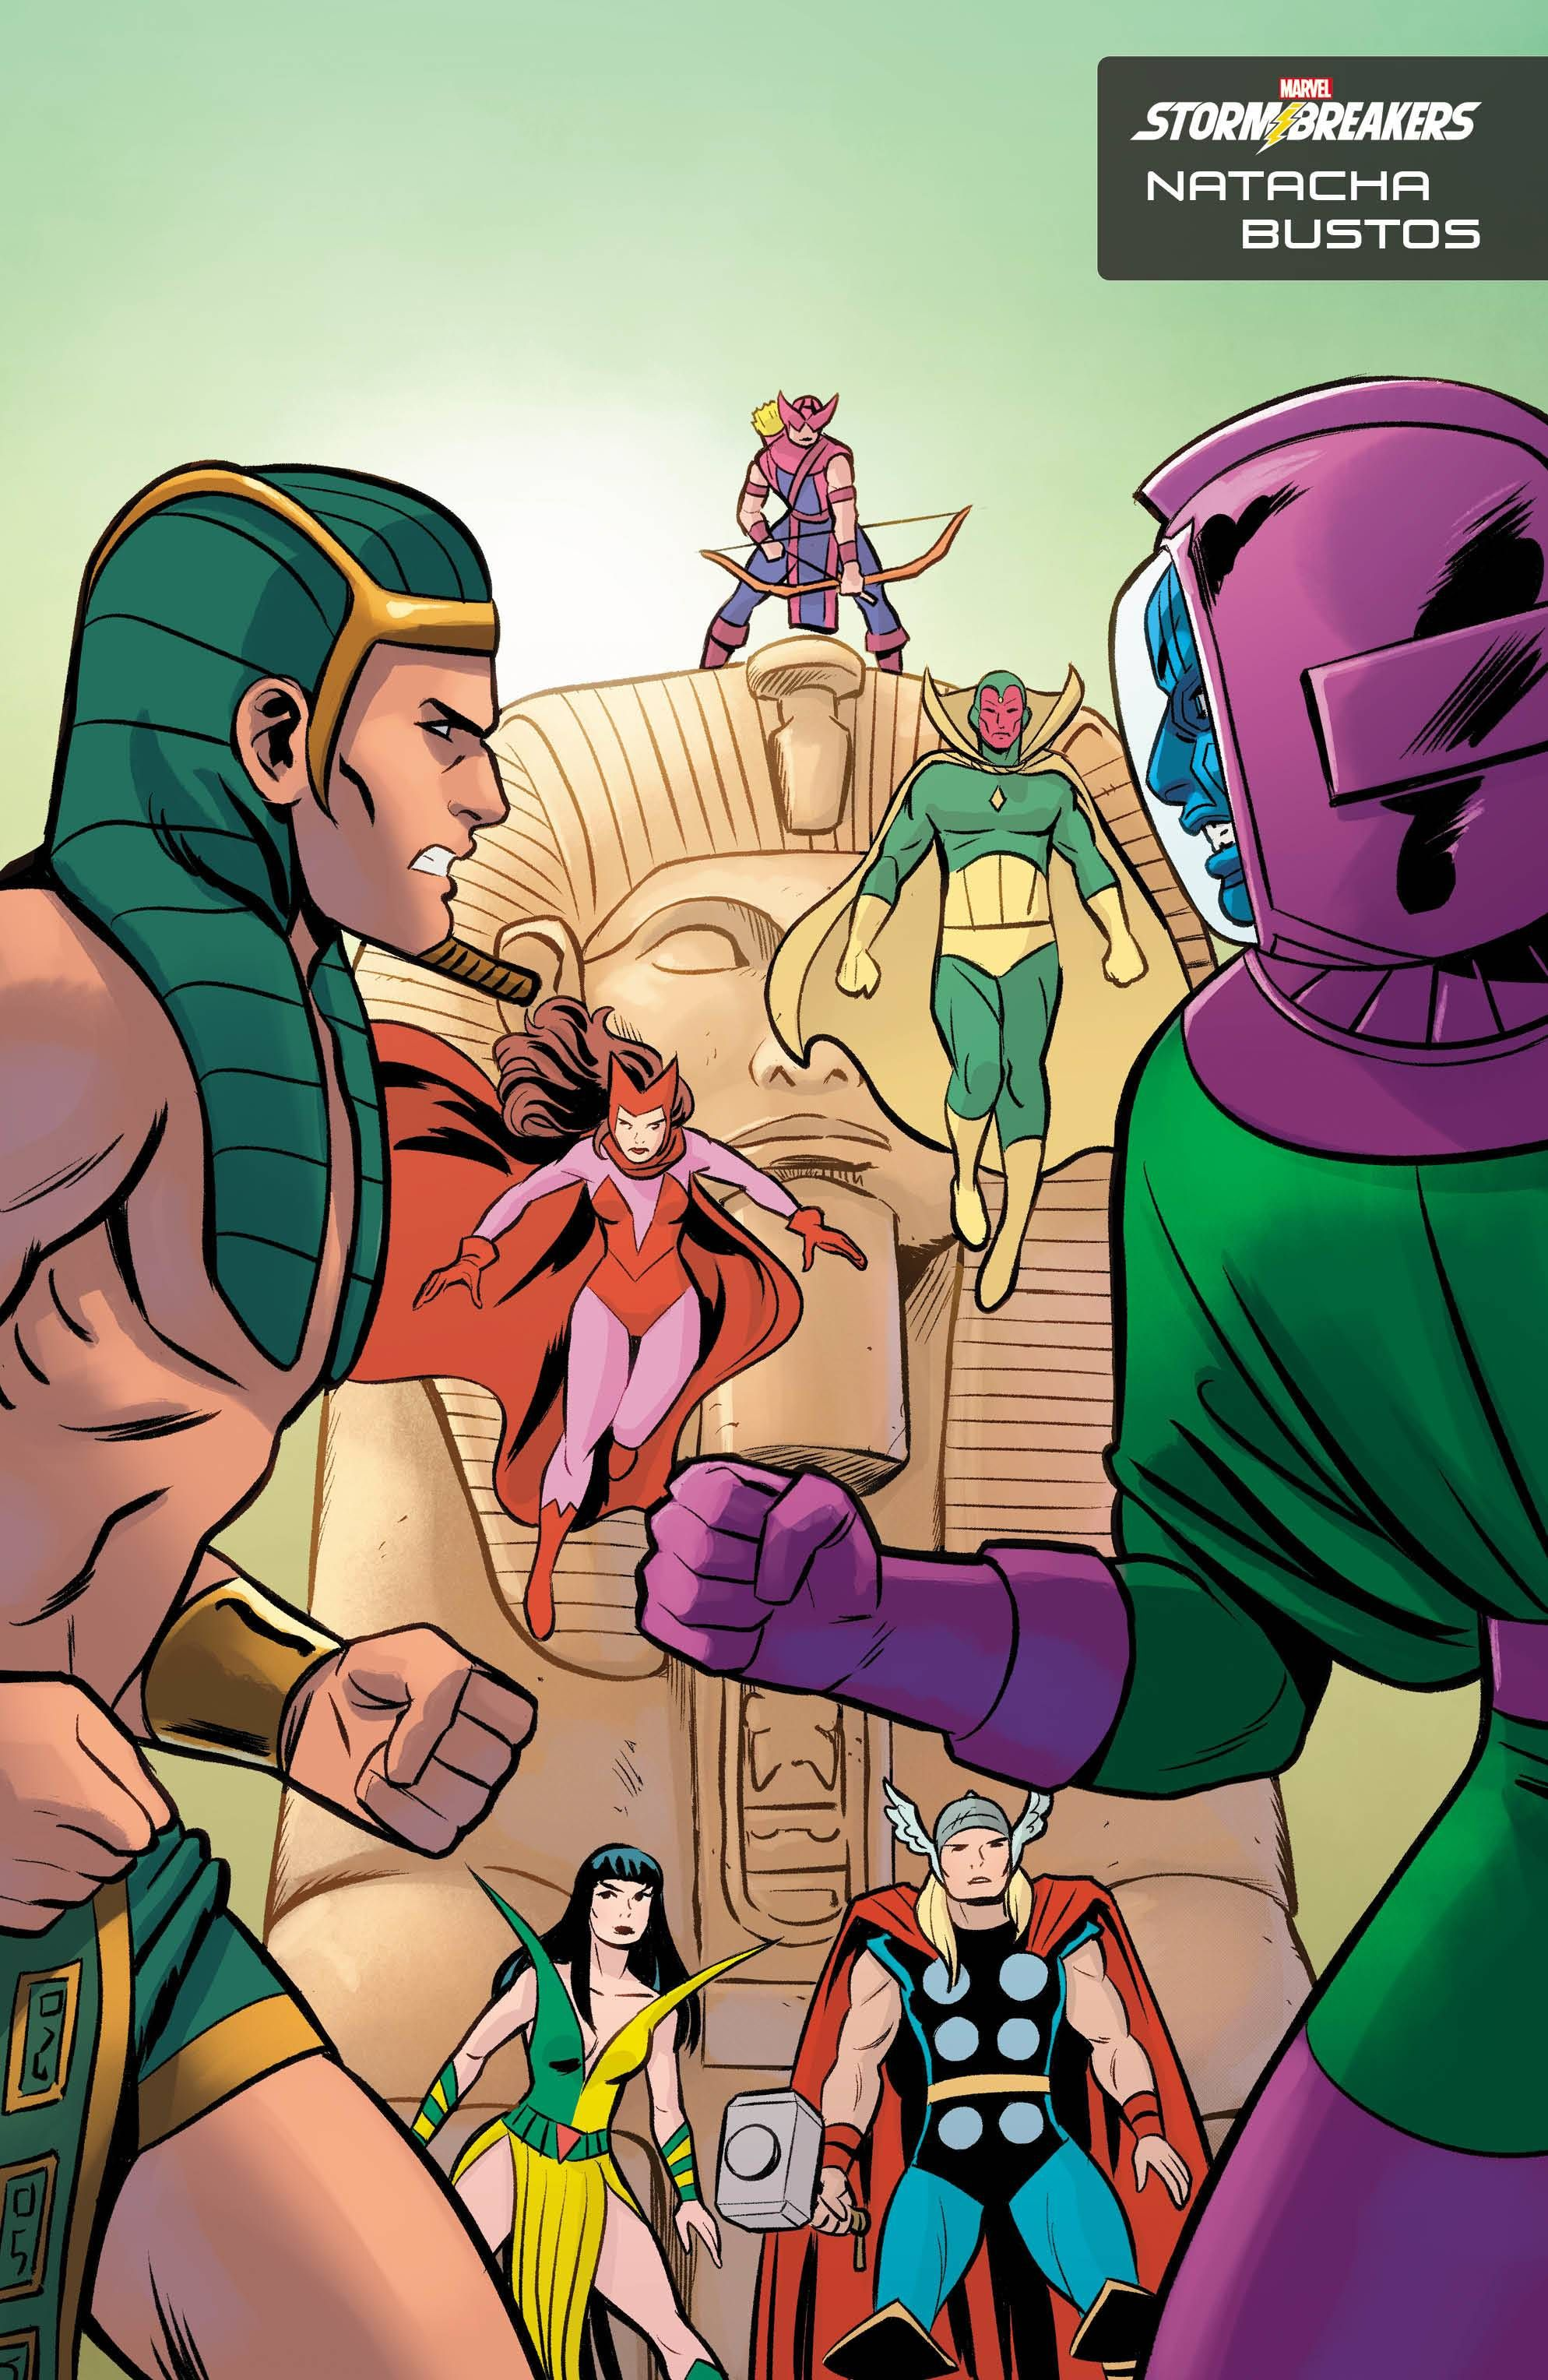 eyJidWNrZXQiOiJnb2NvbGxlY3QuaW1hZ2VzLnB1YiIsImtleSI6ImNmYjYyYjUxLWQ3NmMtNDI1Ny05NjY5LTIzOWRmNThiYjM1NC5qcGciLCJlZGl0cyI6W119 ComicList: Marvel Comics New Releases for 08/18/2021